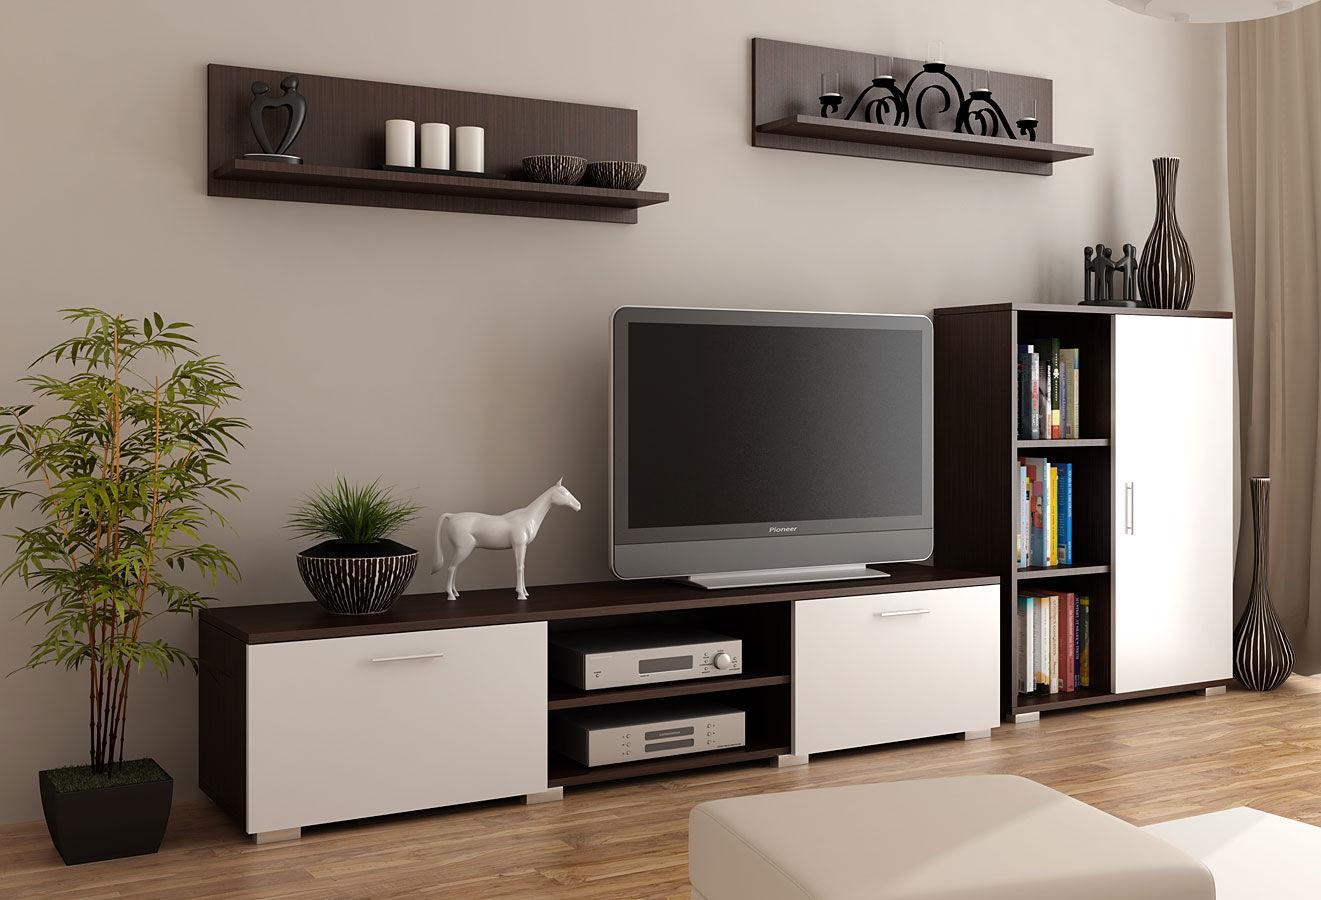 Komplet mebli RTV Pixelo 6X - biały + wenge